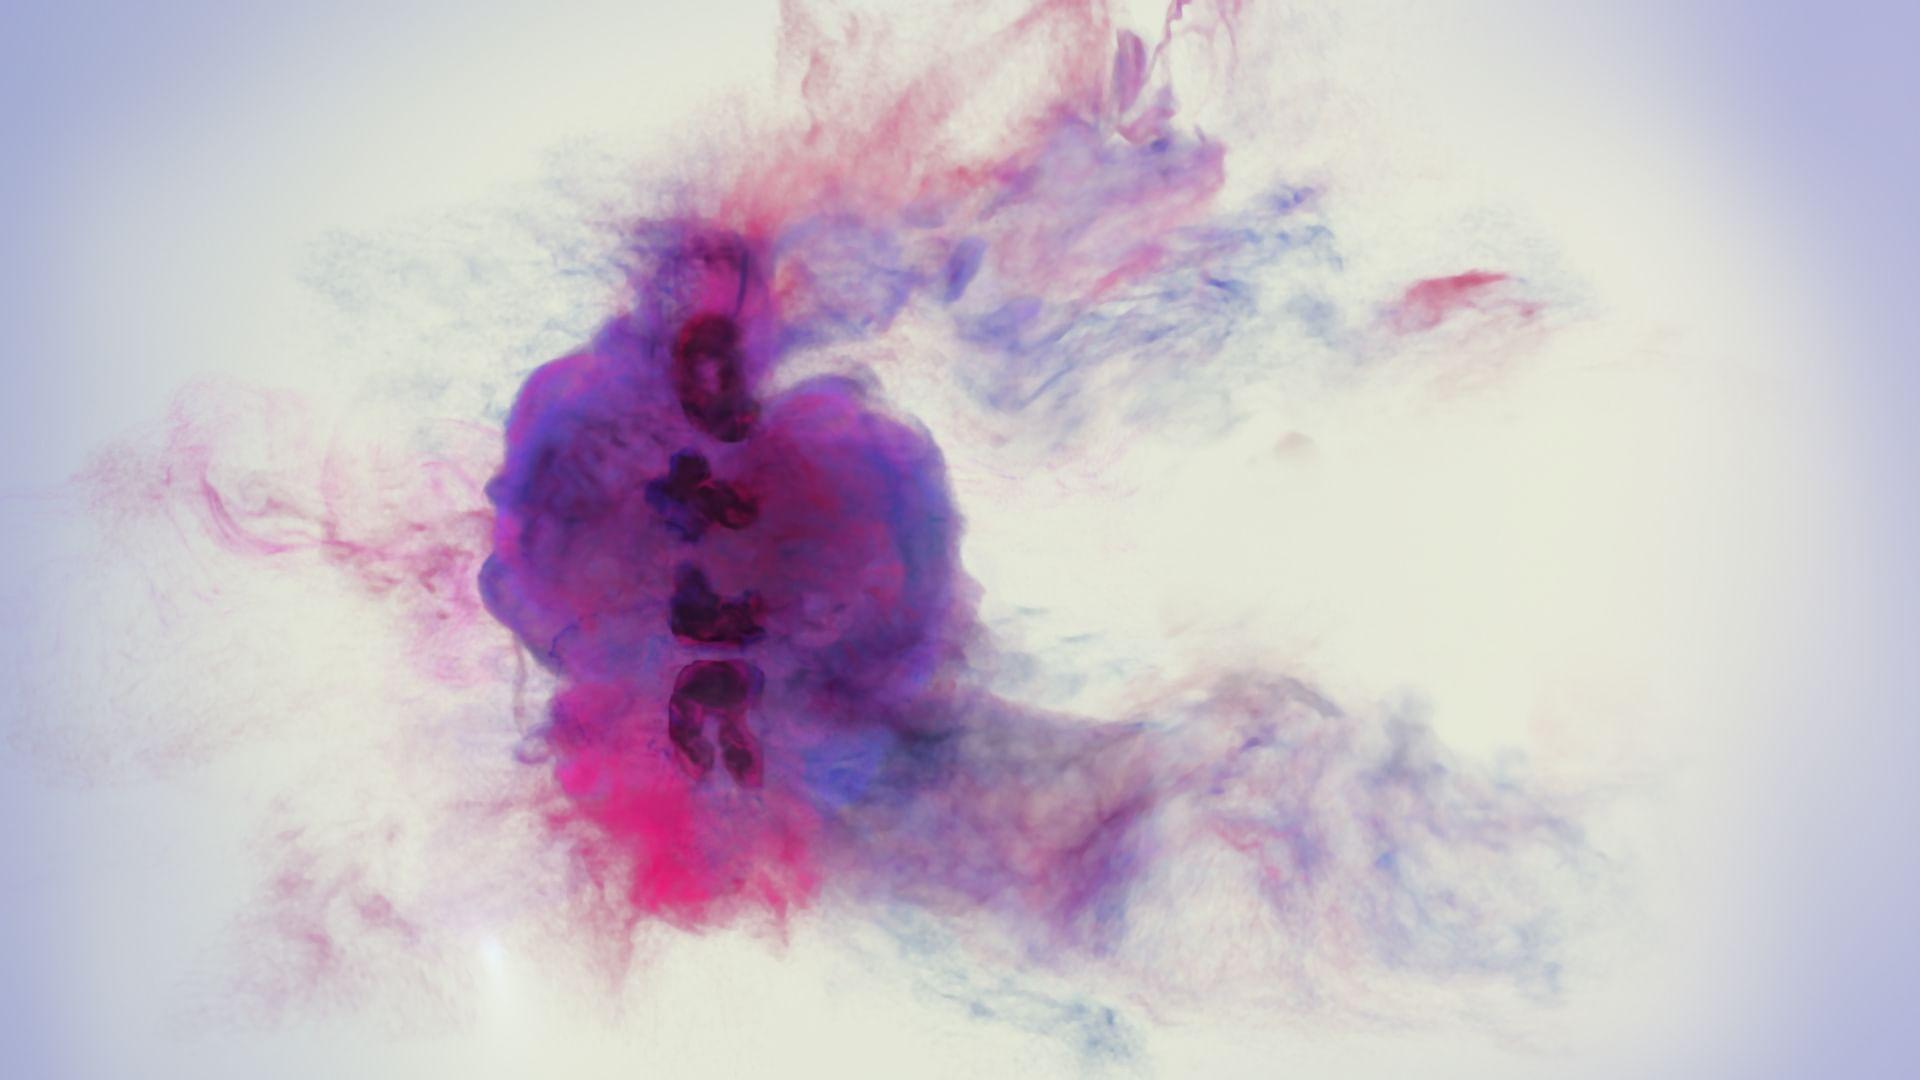 Sexy fick freundin aus oldenburg geil durchgefickt - 4 8